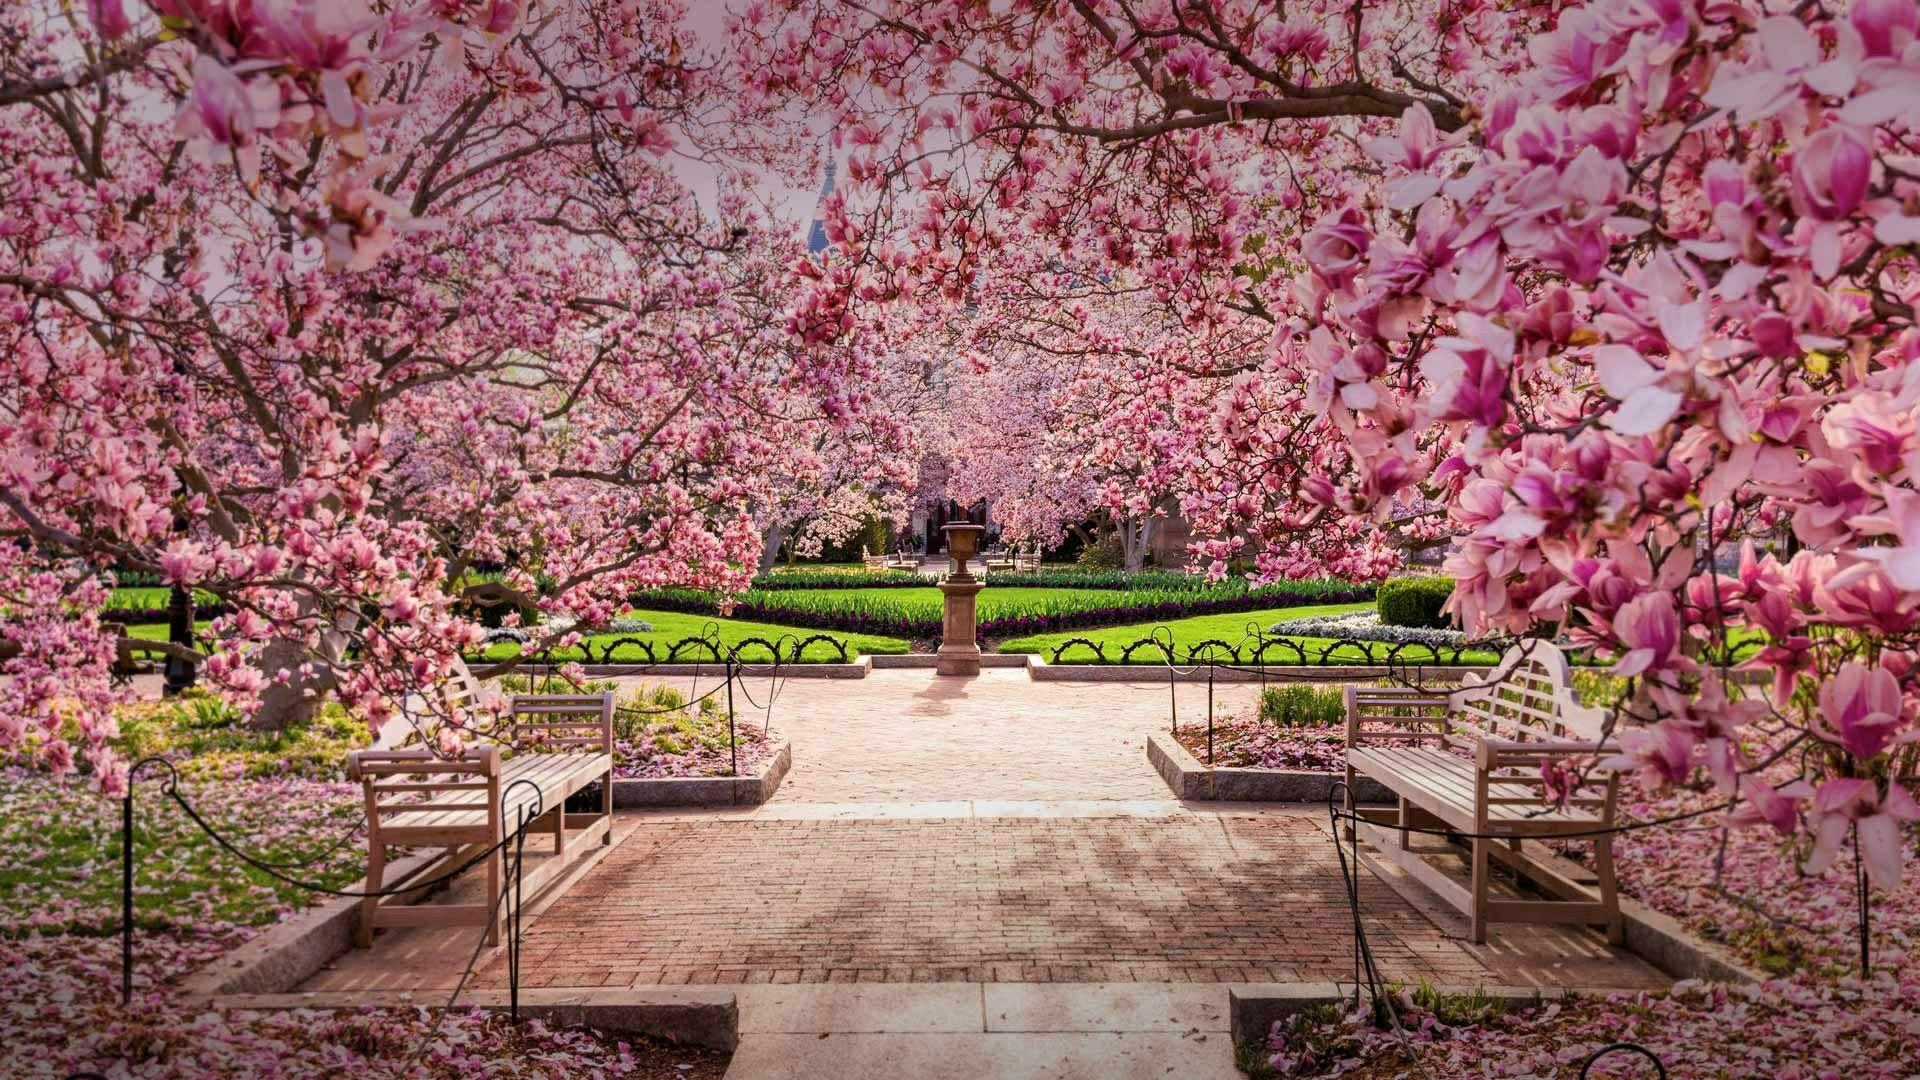 Cherry blossom in National Mall (Washington DC) wallpaper